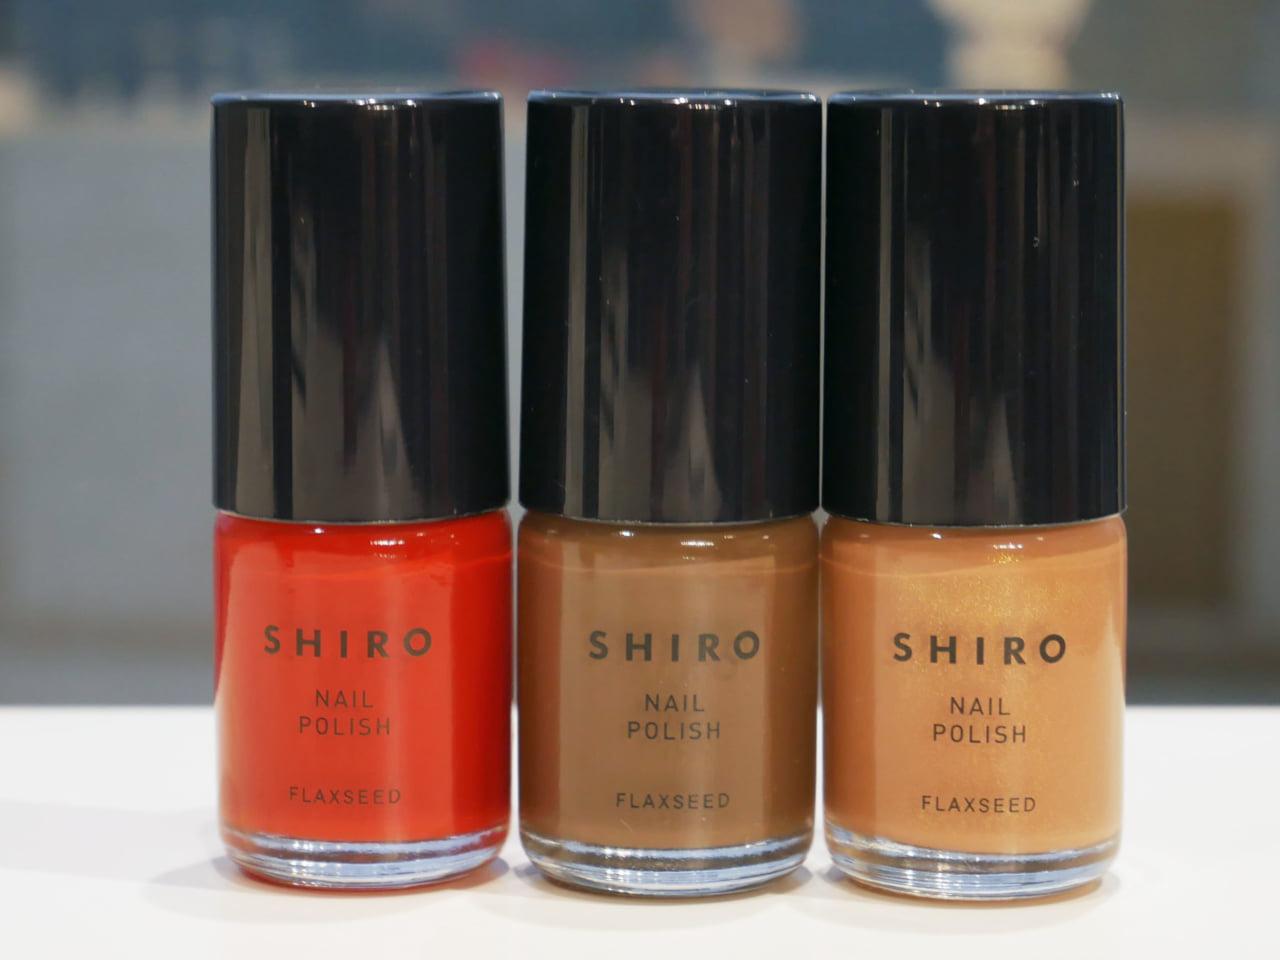 SHIRO ショコラネイル